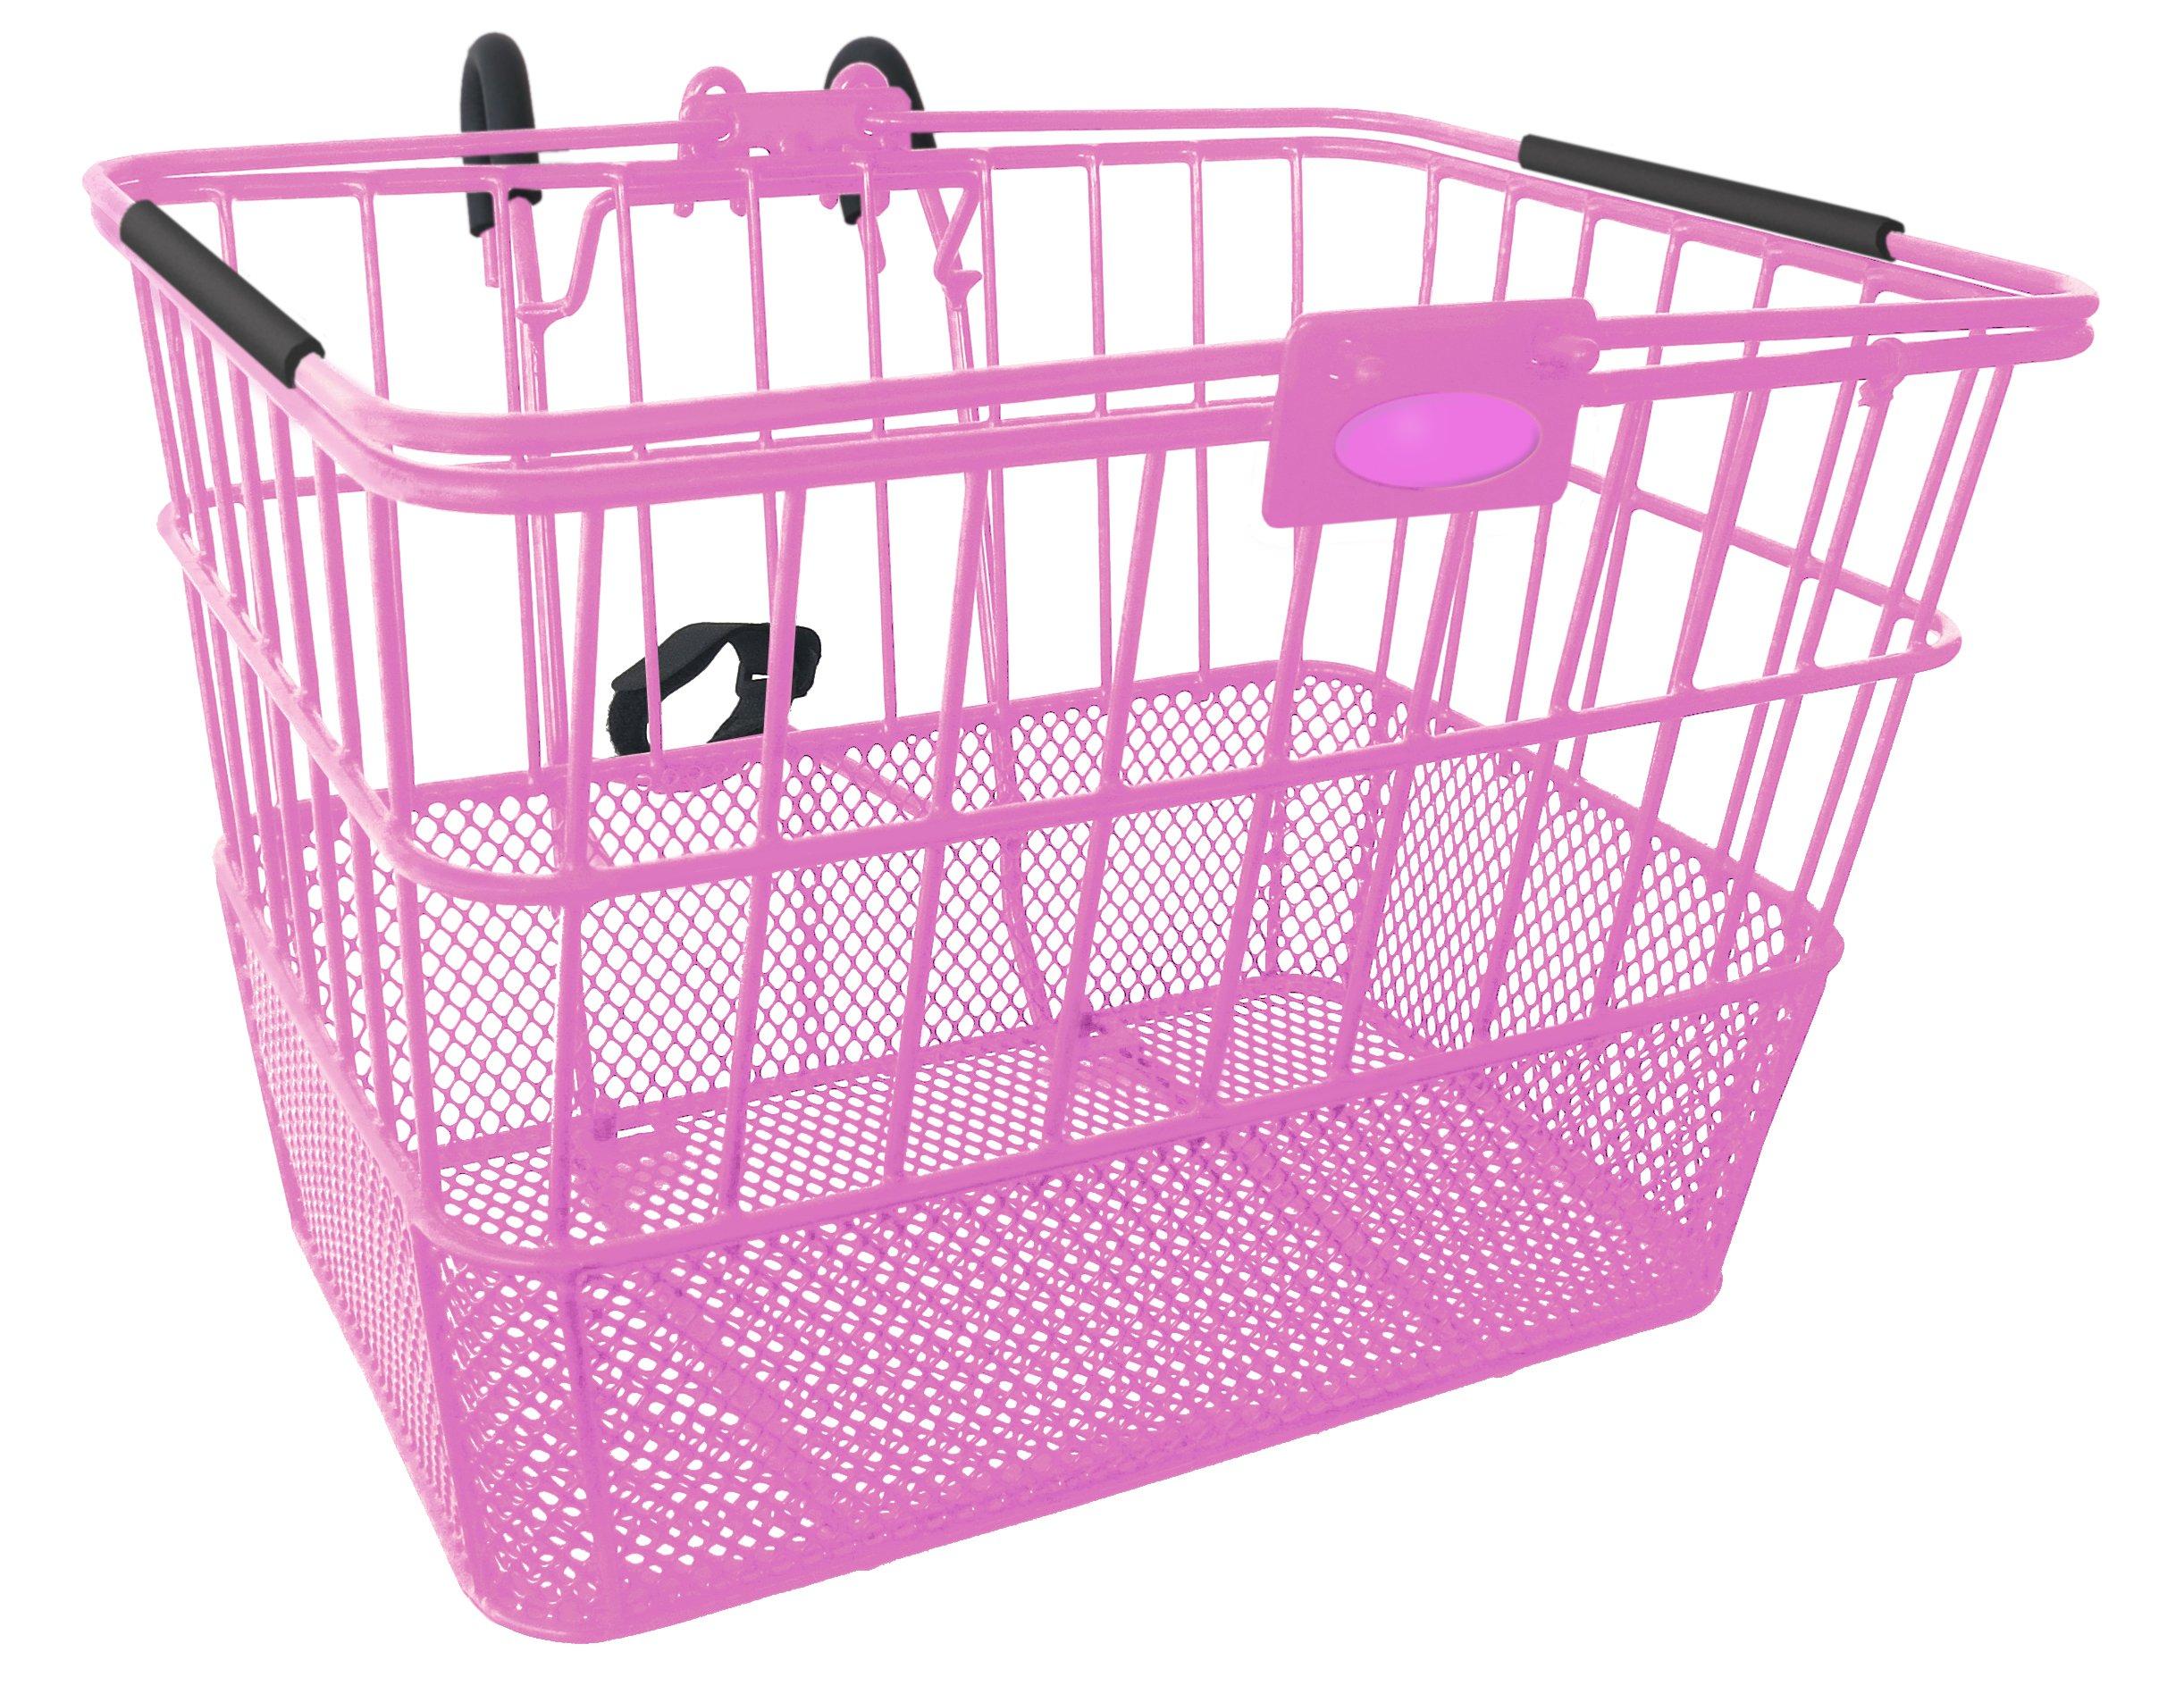 Mesh Bottom Lift-Off Basket w/ Bracket, Pink